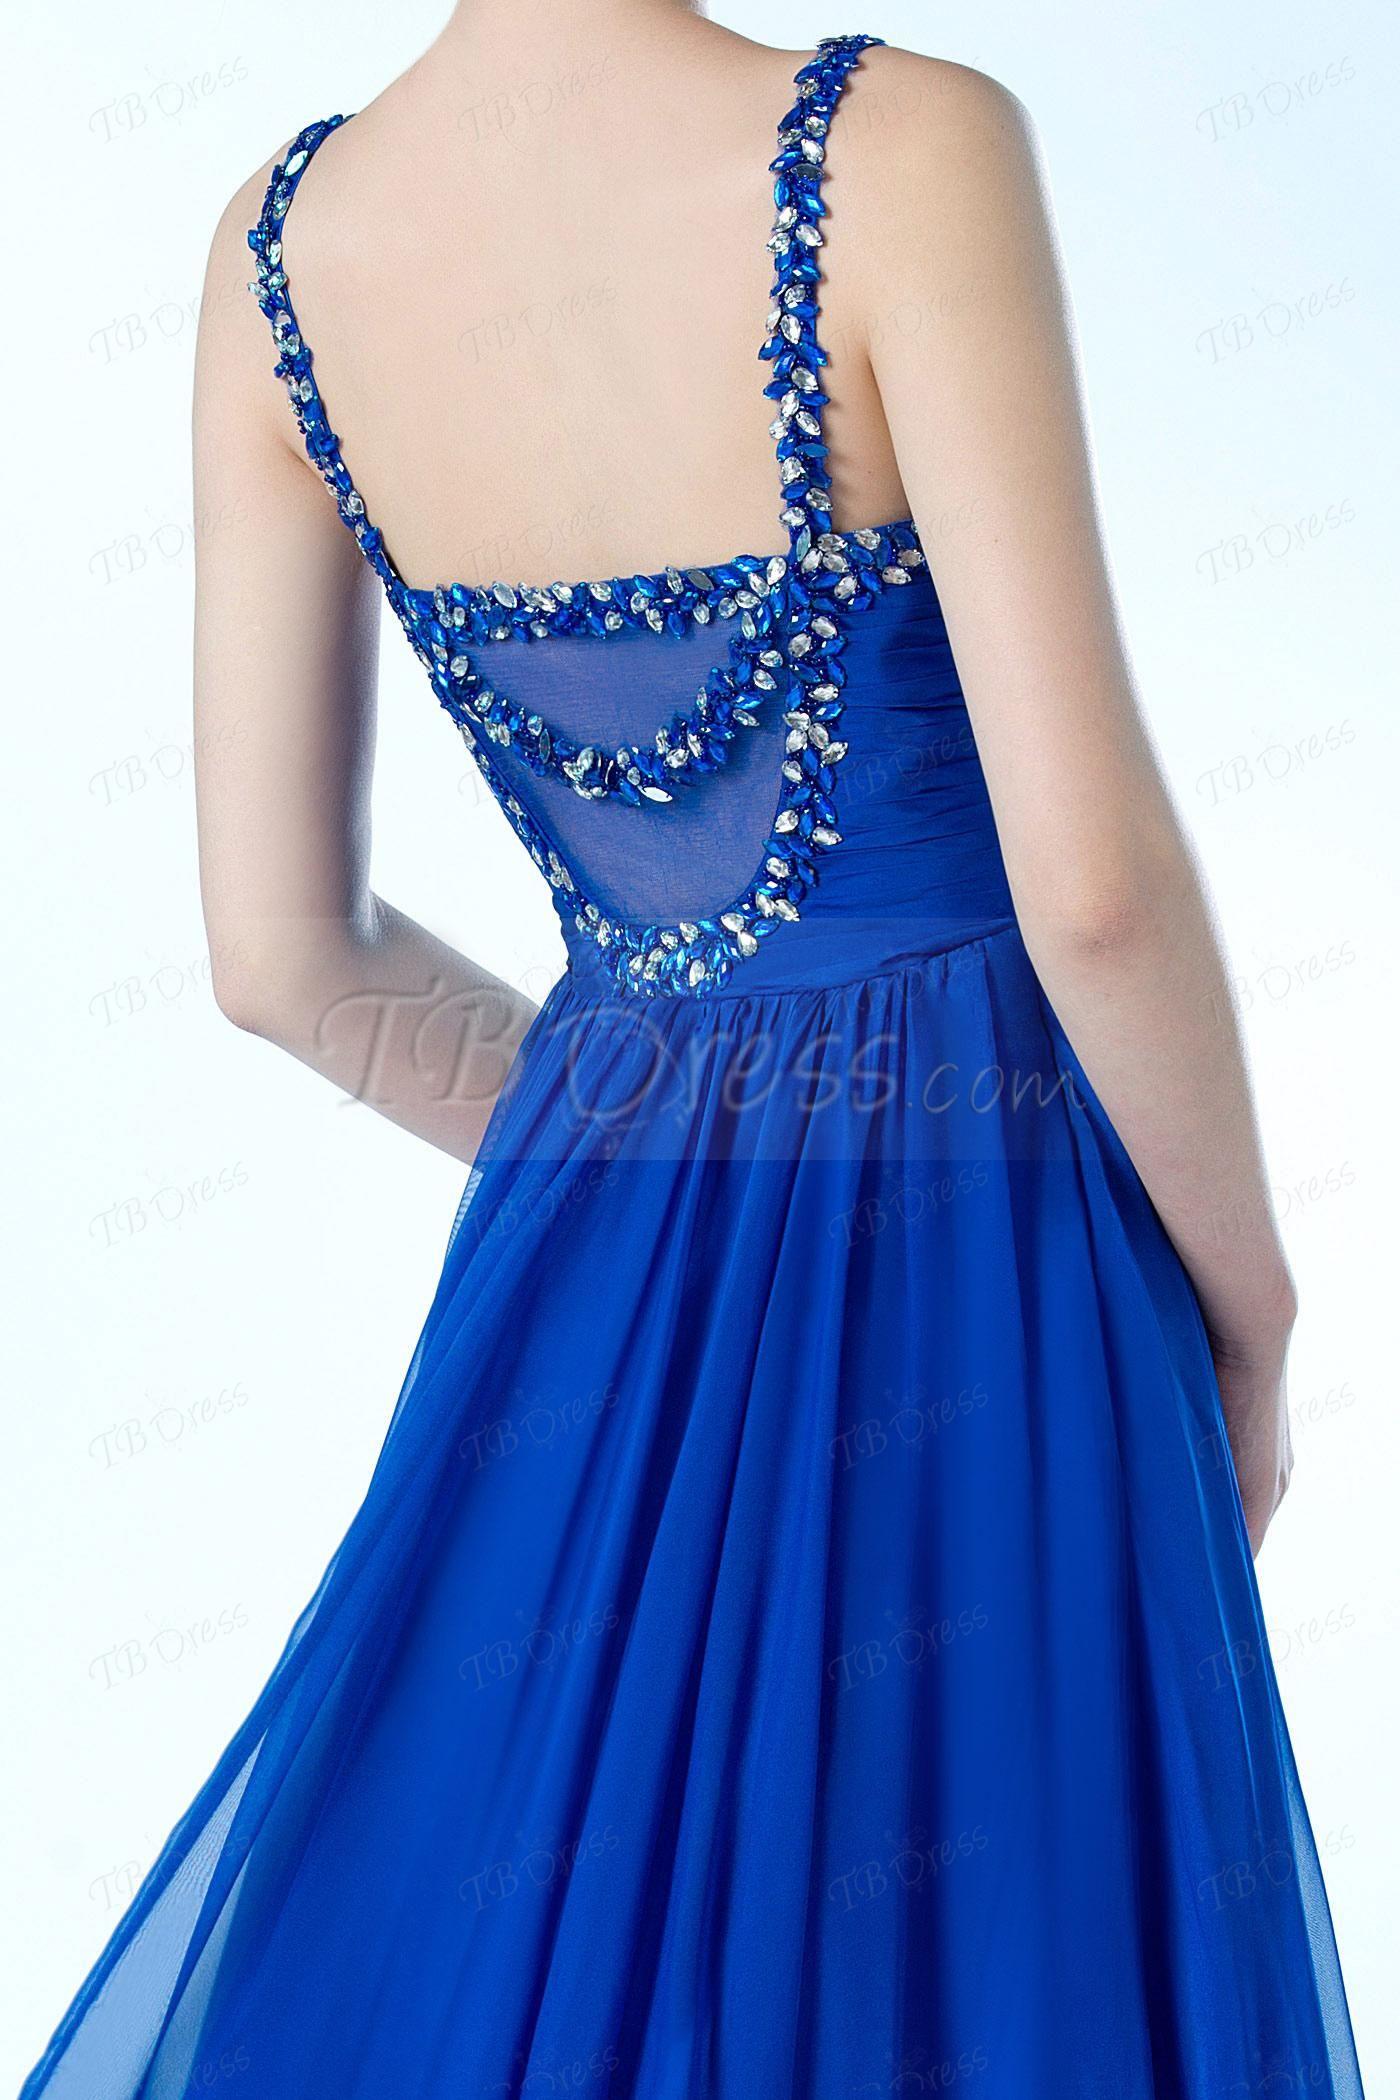 Vogue Sweetheart Neckline A-Line Floor Length Beading Evening dress